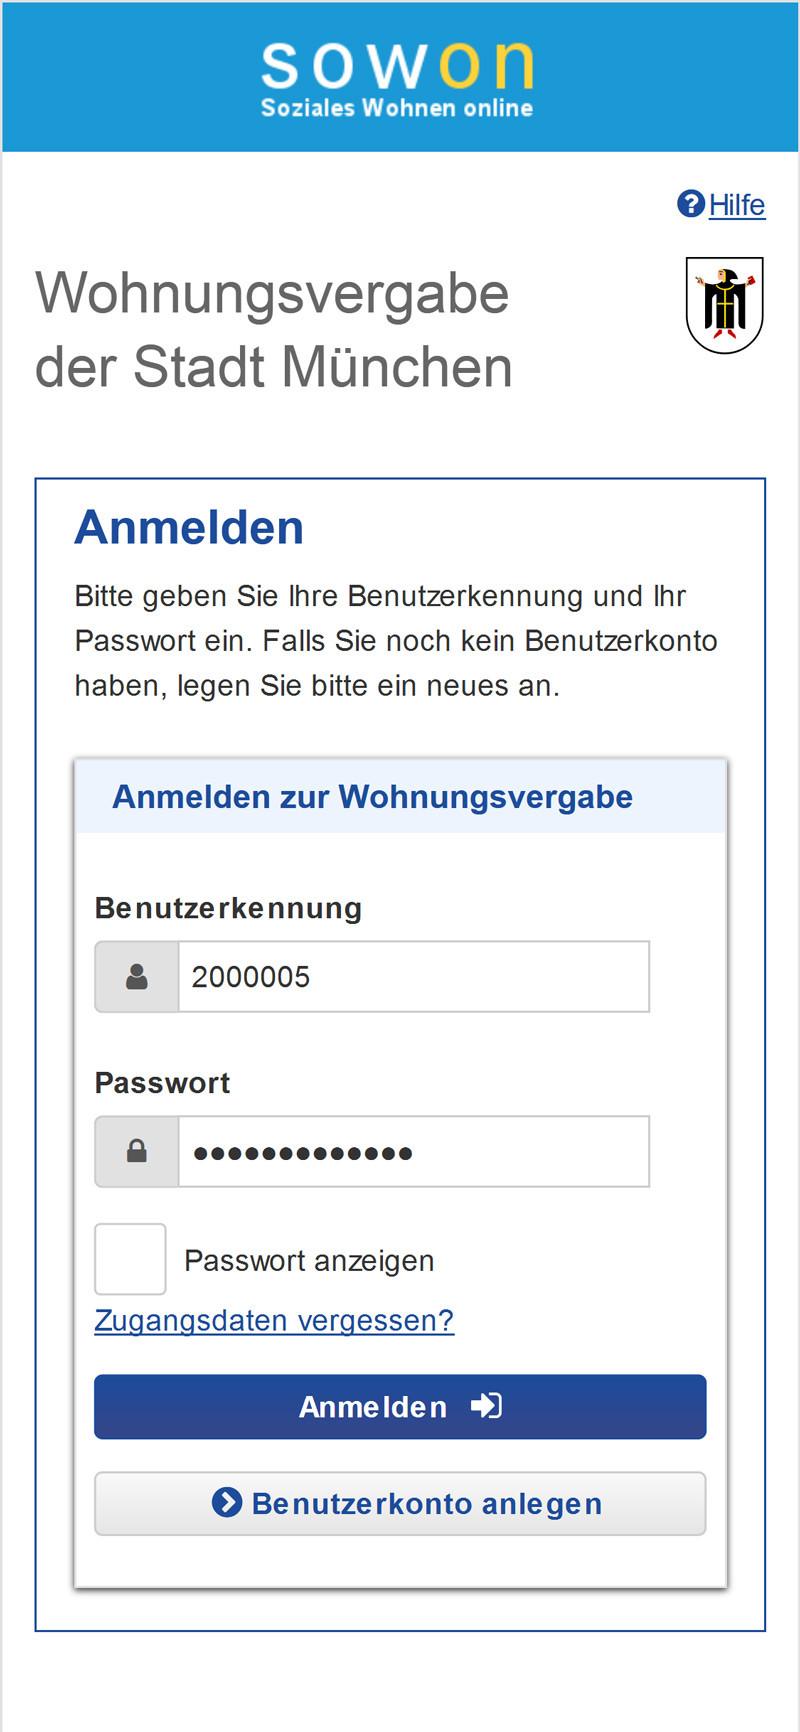 SOWON_Anmeldung_Screenshot